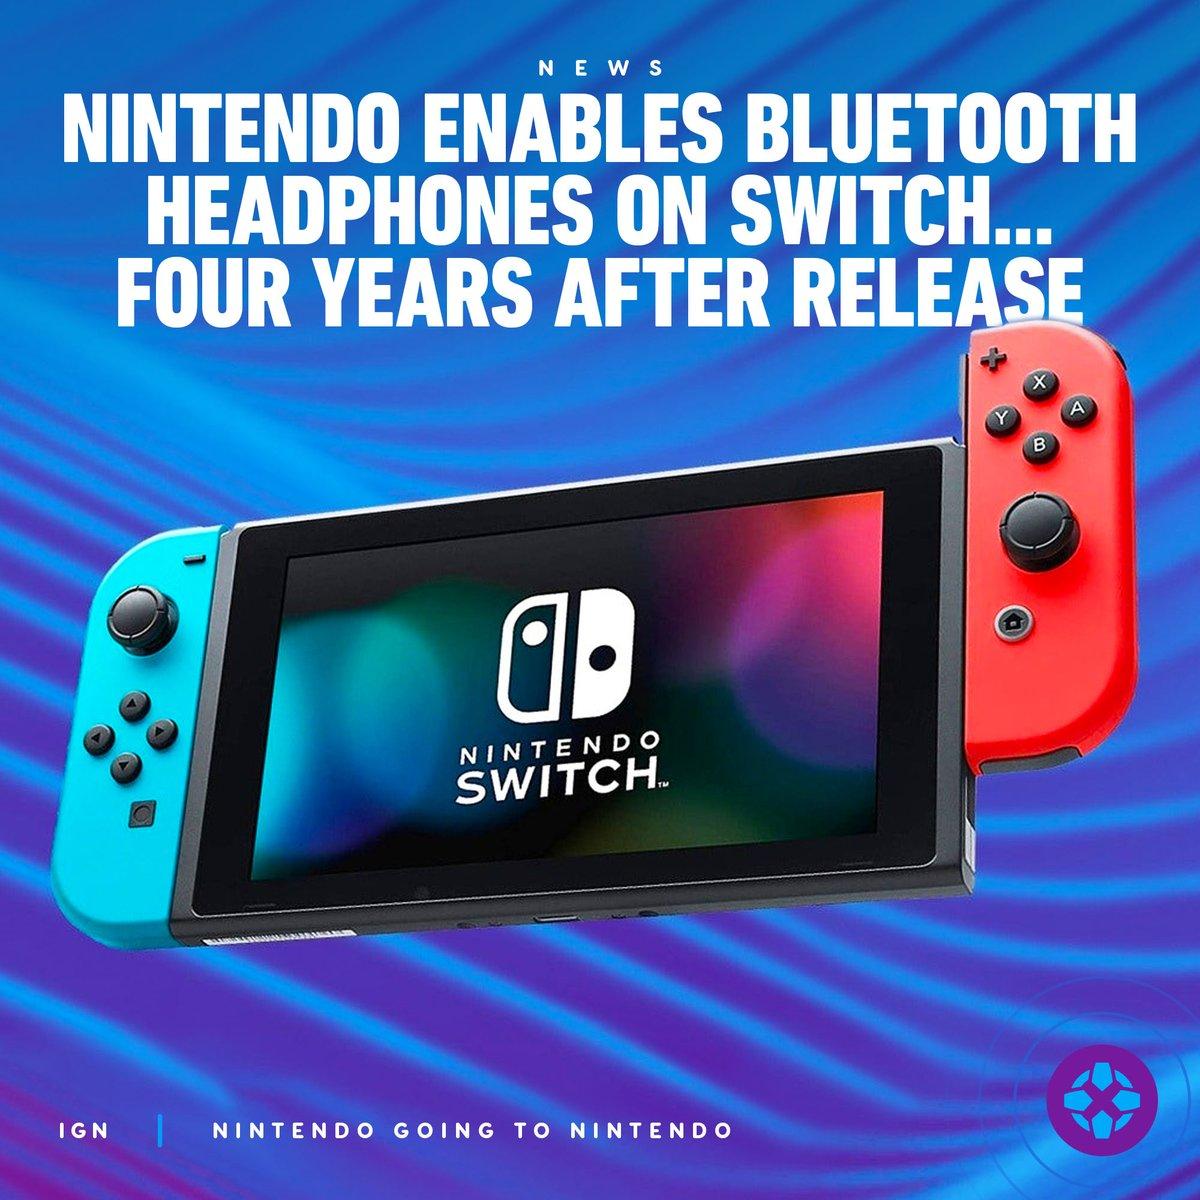 @IGN's photo on Bluetooth